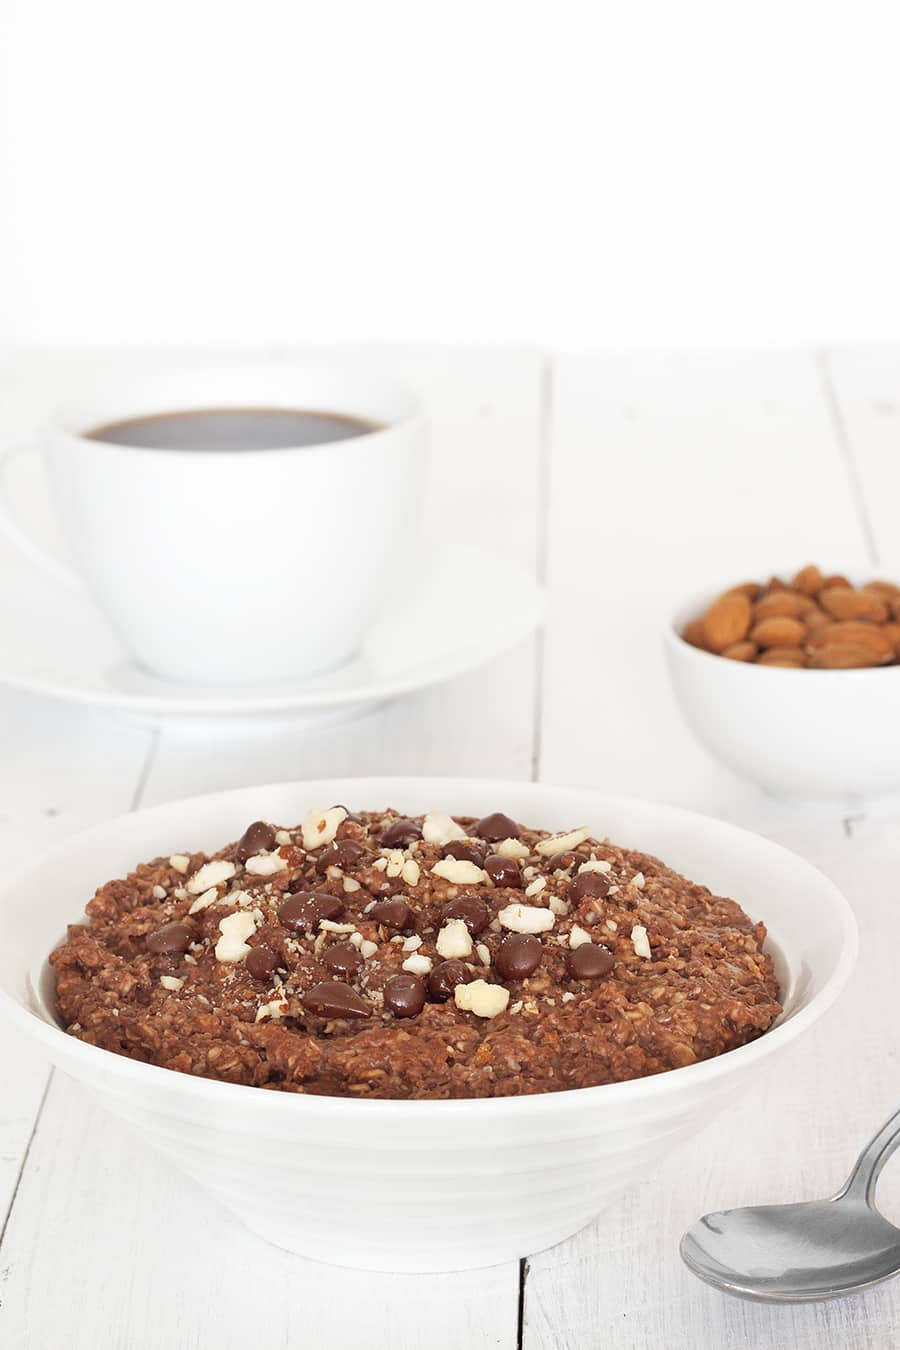 Healthy Chocolate Porridge - A Nutritious, sugar free but super tasty way to start the day | cookbakeeat.com #chocolate #porridge #breakfast